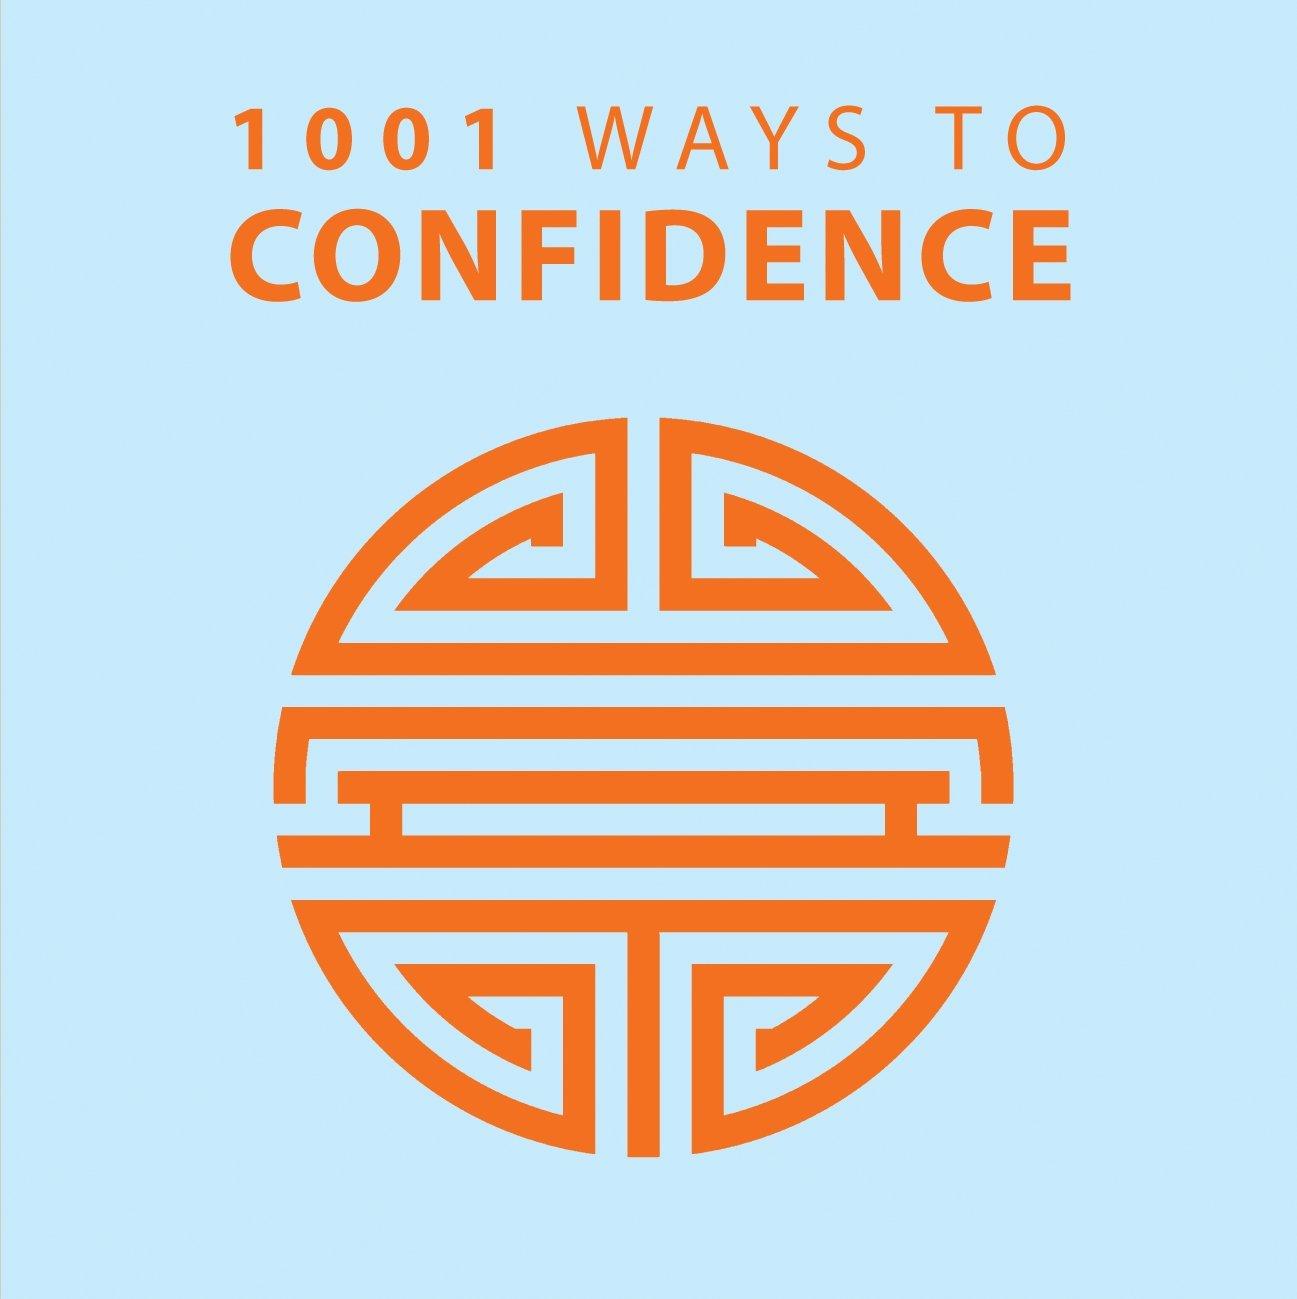 1001 Ways to Confidence (1001 Ways Series): Arcturus Publishing:  9781848585485: Amazon.com: Books